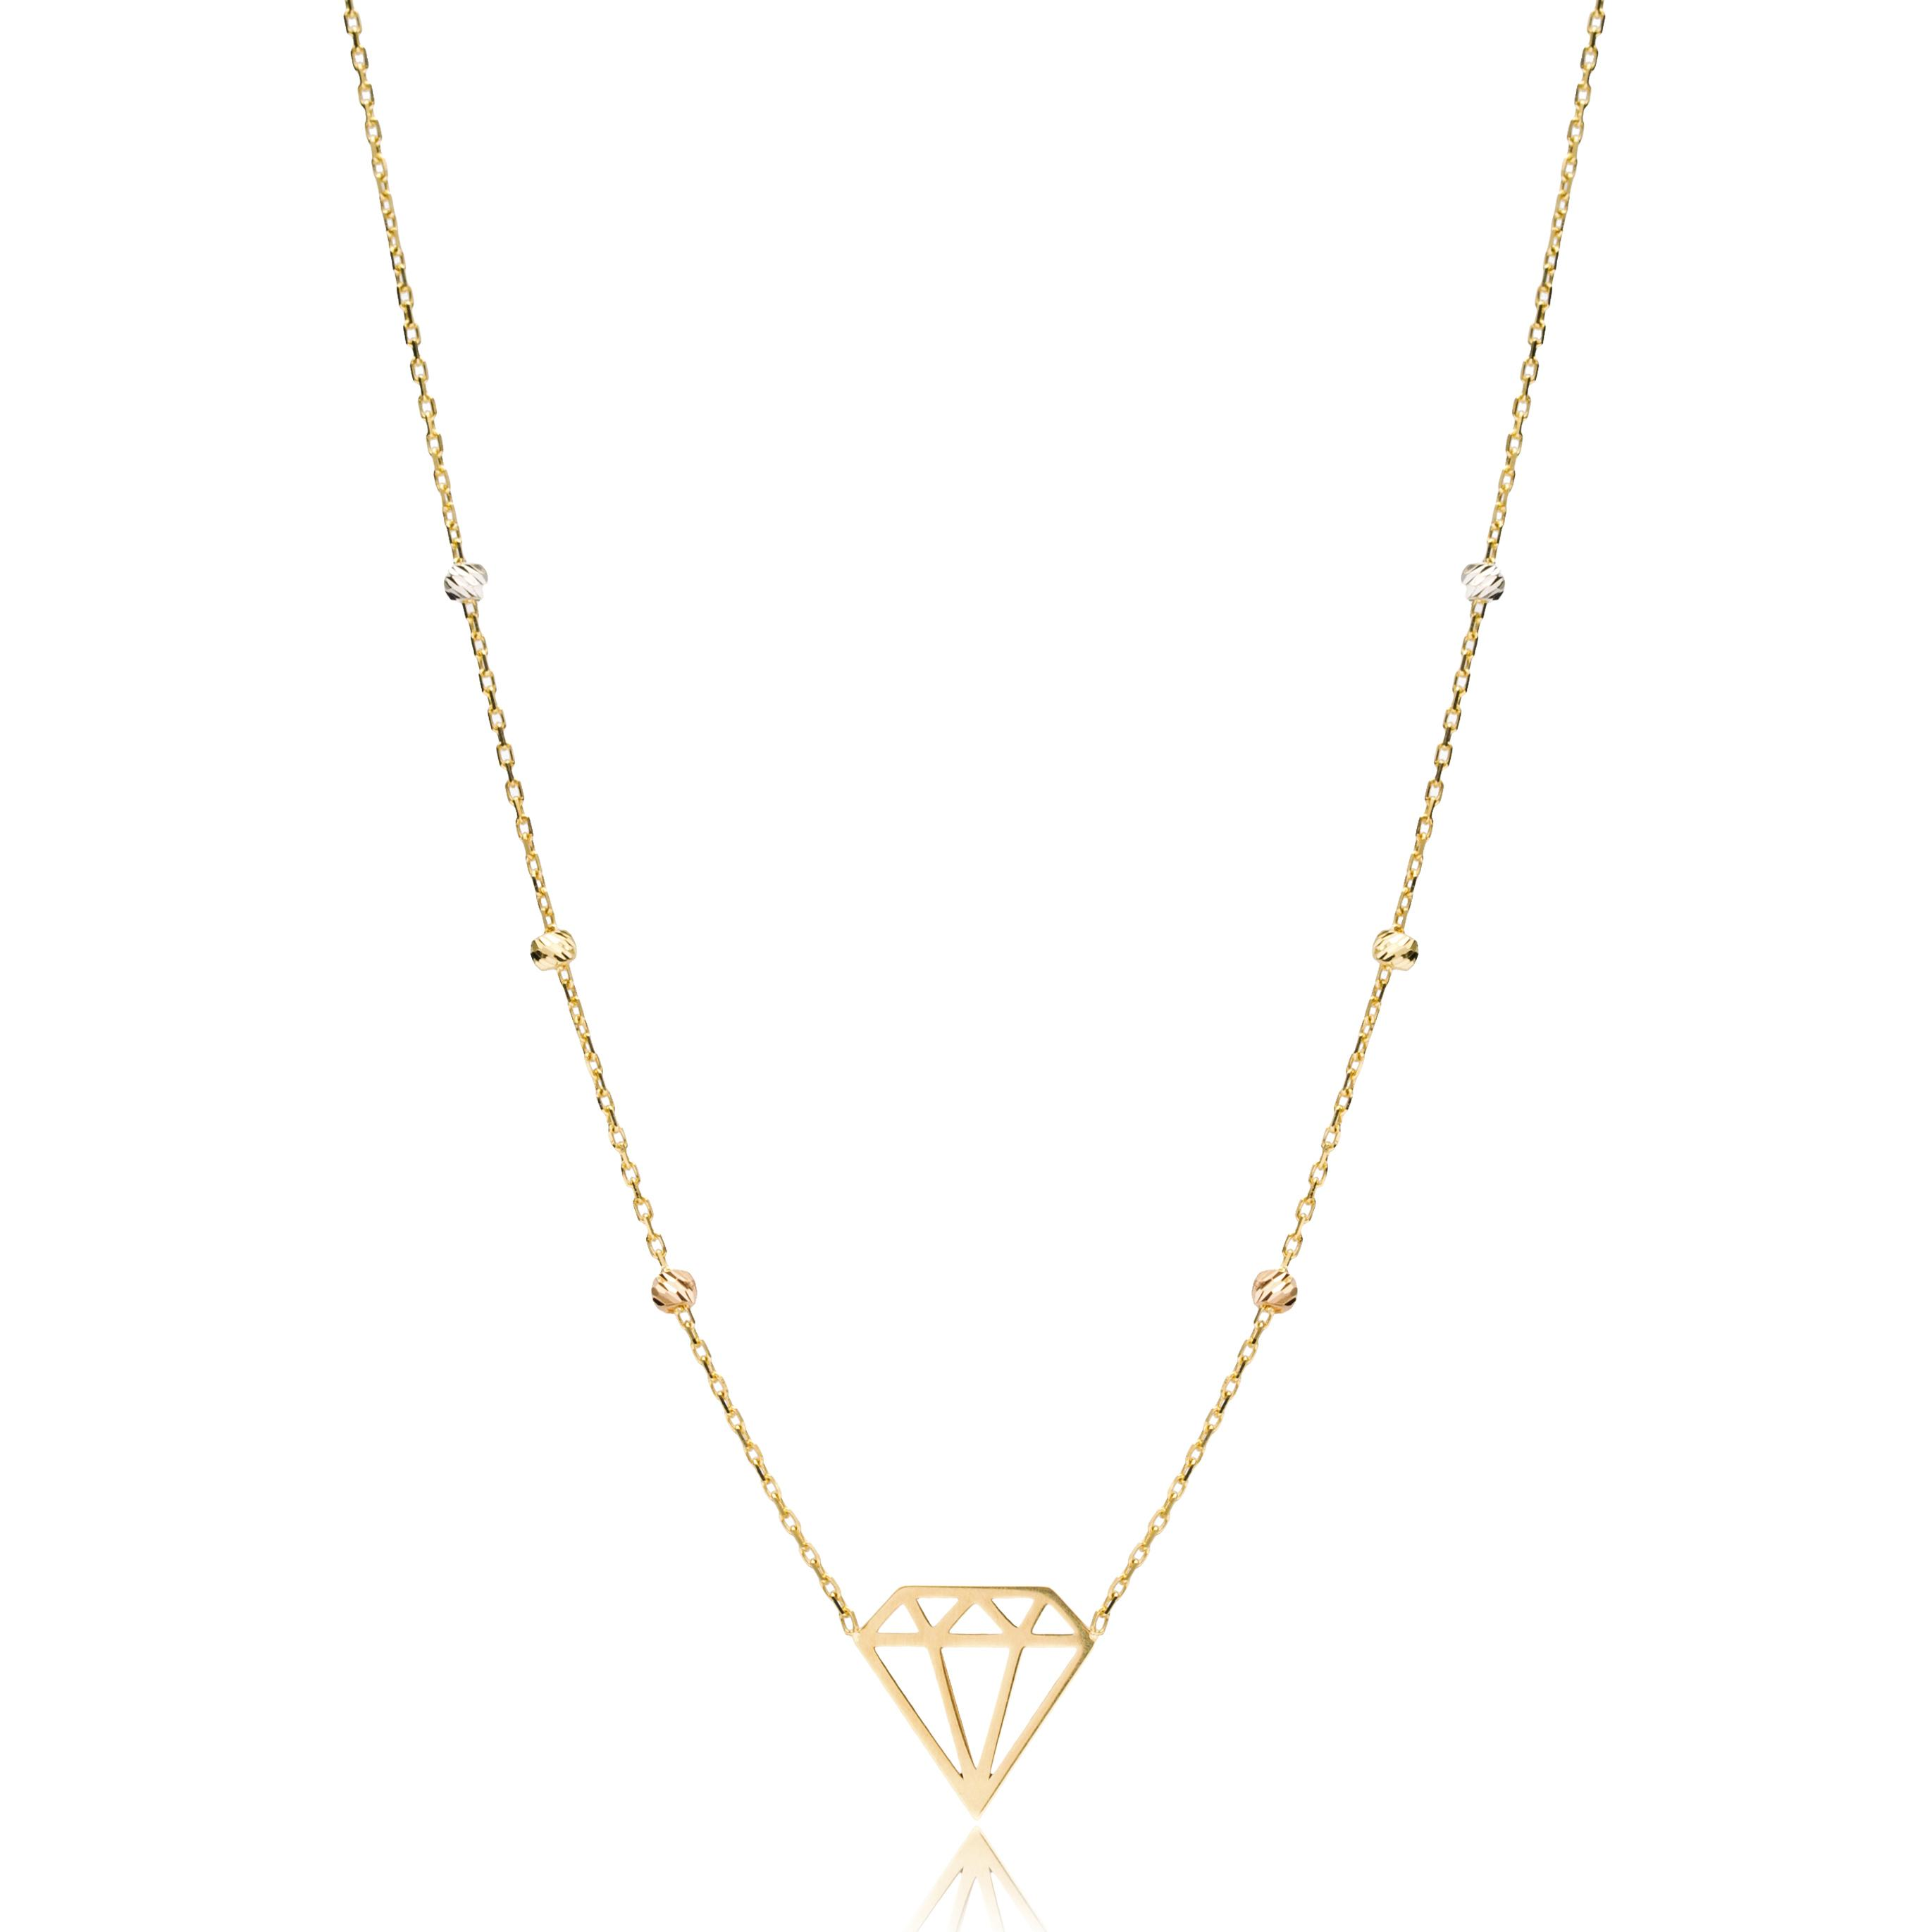 14K Gold Diamon Shape Necklace Wholesale Handmade Turkish Jewelry